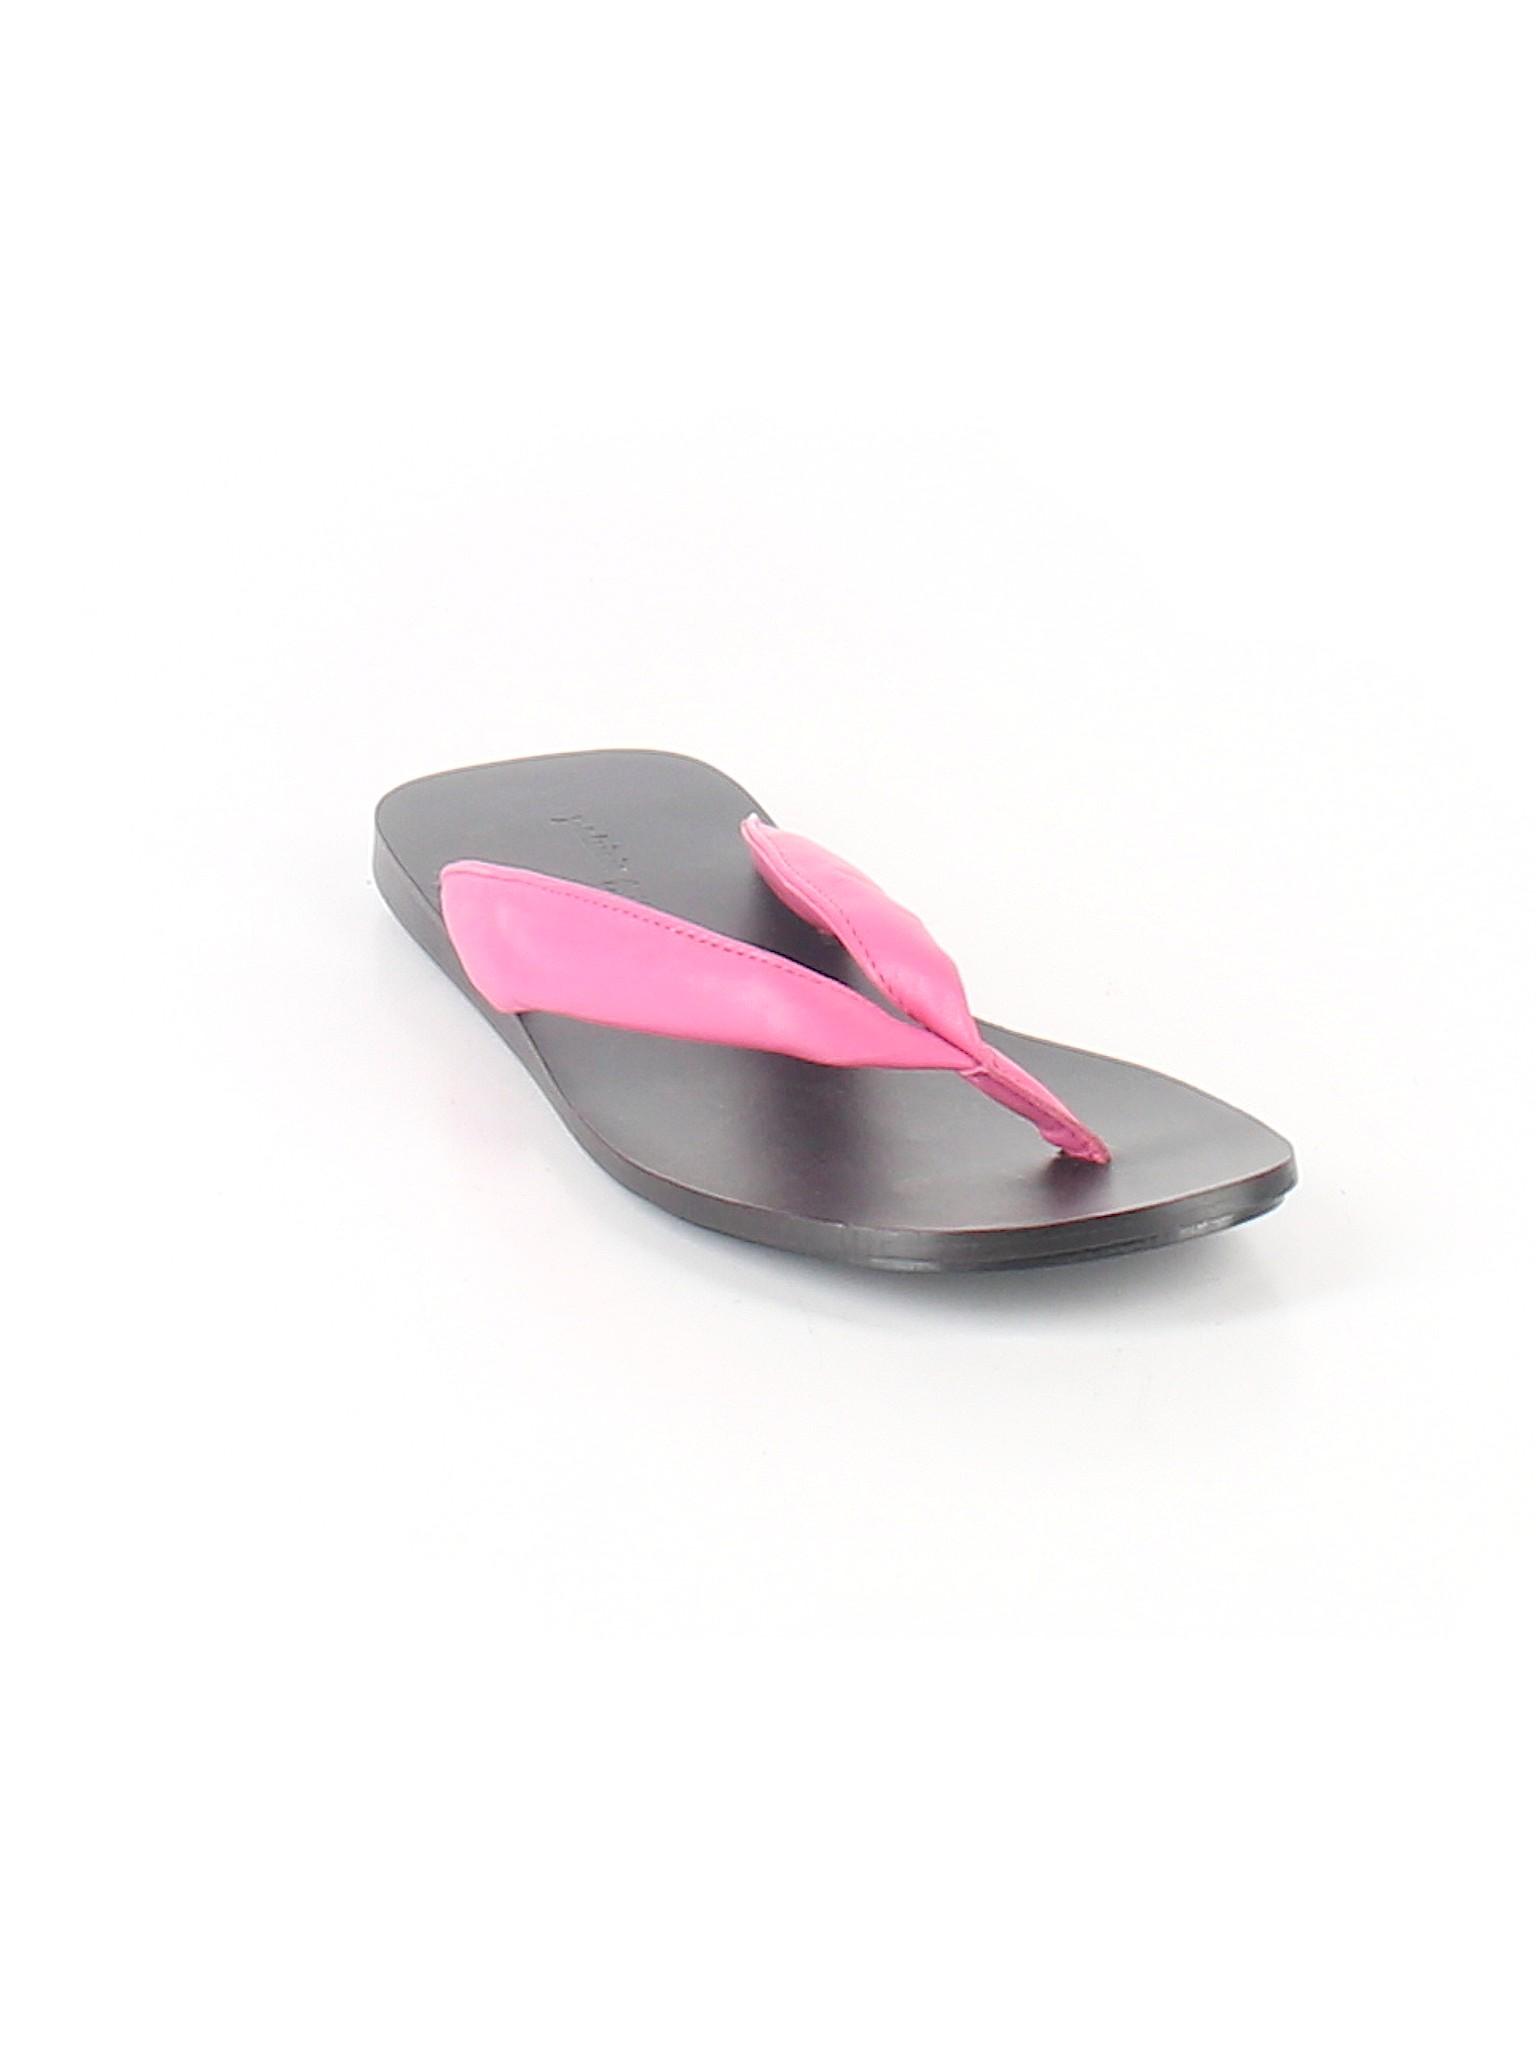 Green Patricia promotion Boutique Flip Flops BEOw5qH